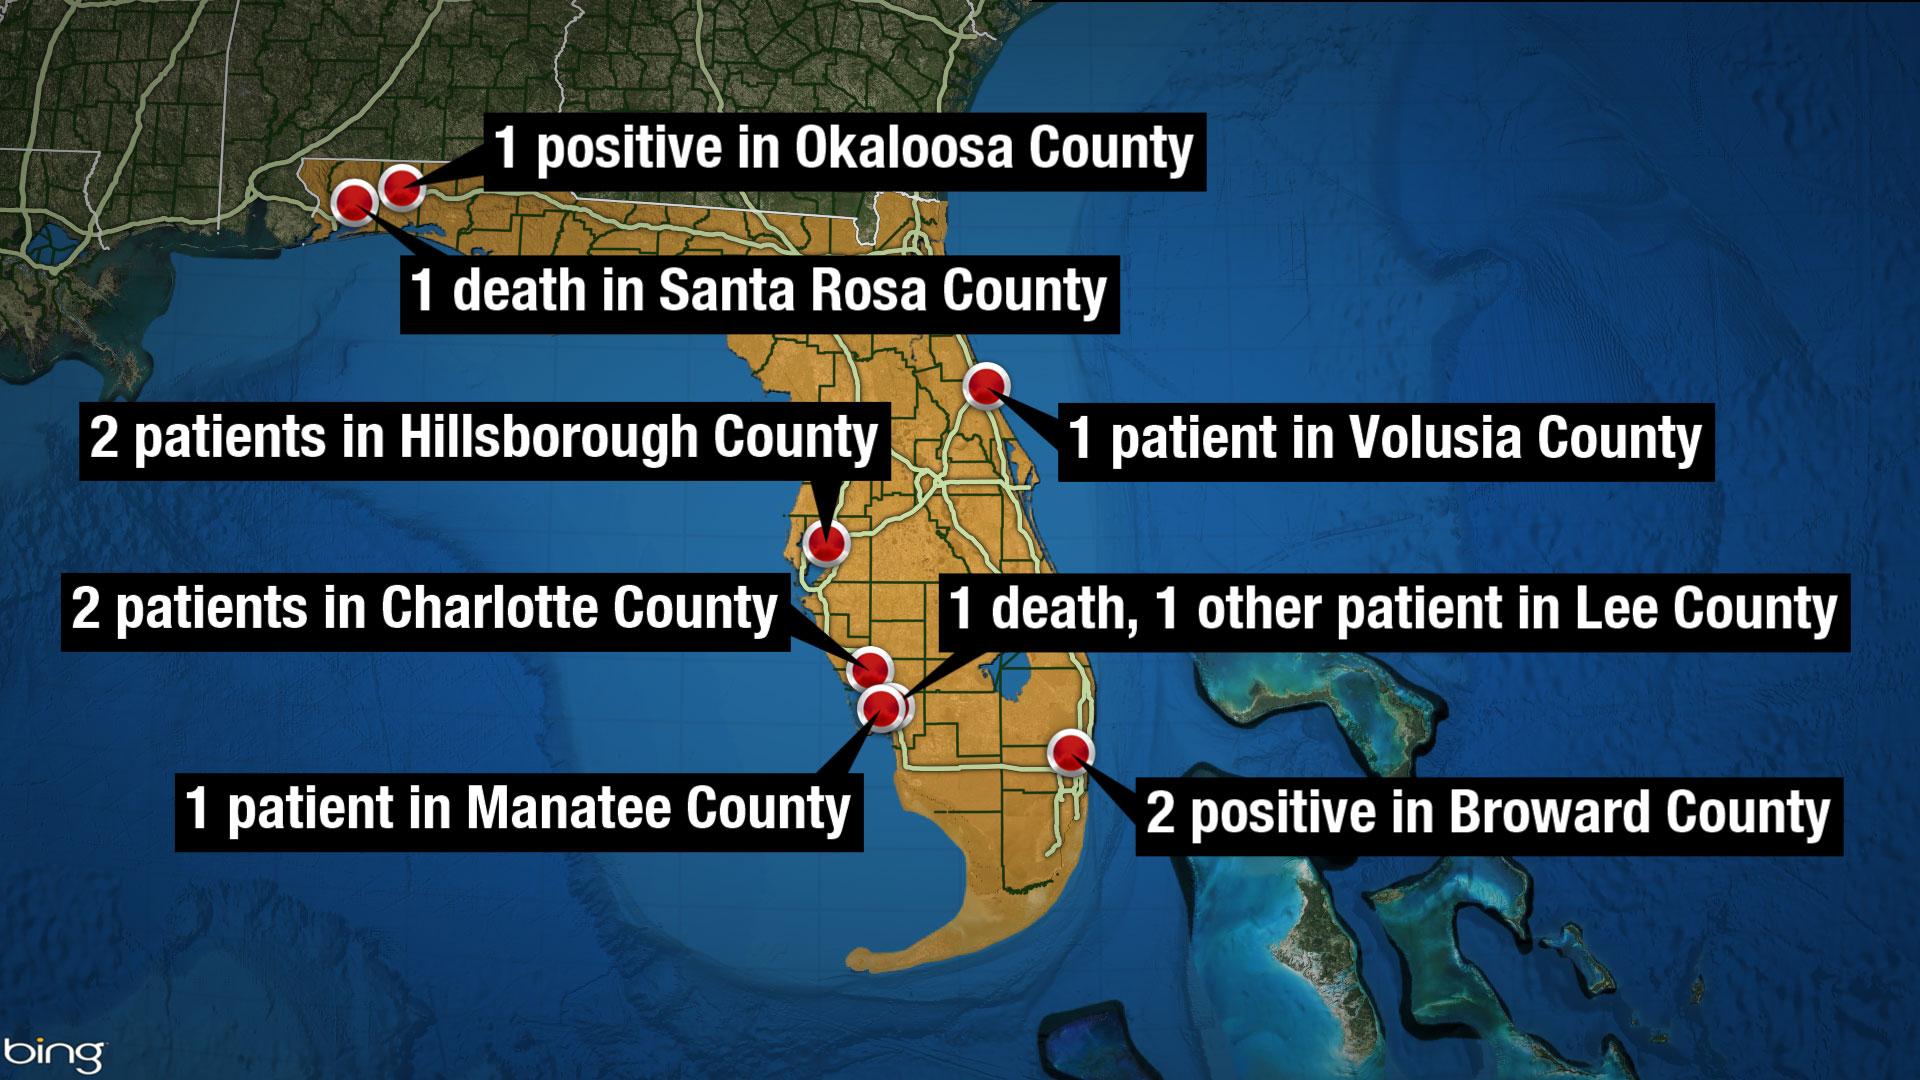 Florida announces 2 coronavirus deaths, 7 new cases in 24 hours